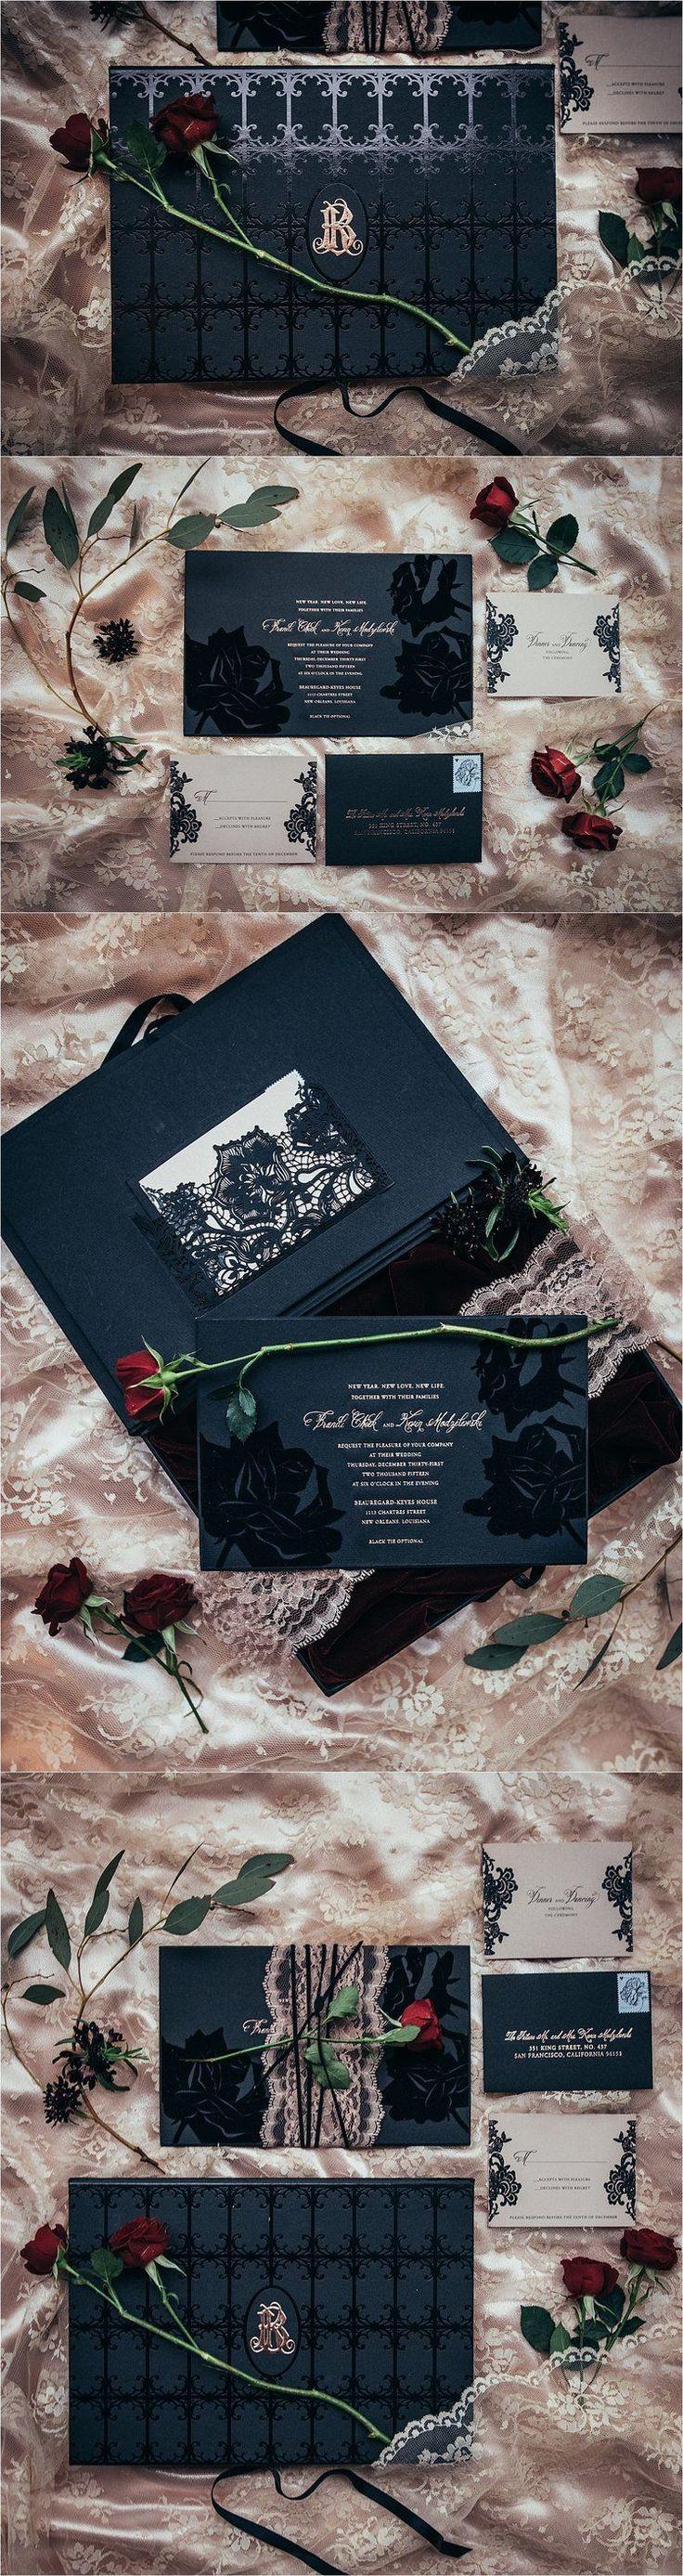 Sapphire Events | Eric James Photography | New Year's Eve Wedding | Gothic Wedding | Twilight Inspired Wedding | French Quarter Wedding | New Orleans Wedding | Pink Black Red Wedding | Lehr and Black | Boxed Invitation | Monogram